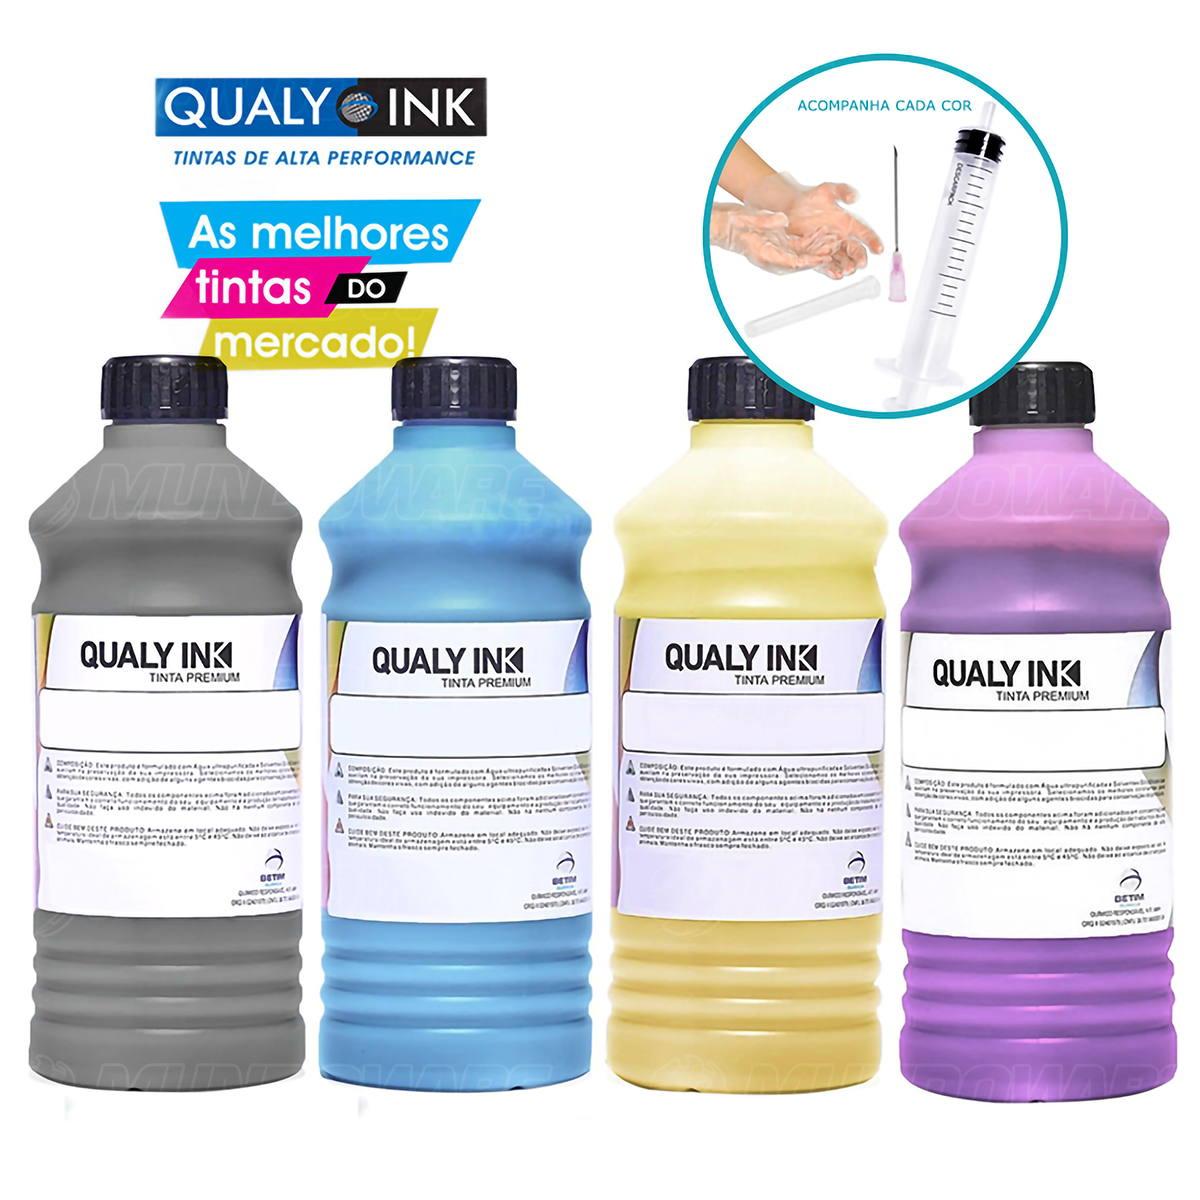 Kit 4 Cores Tinta Corante Qualy-Ink para Brother DCP-T300 T500w T800w T910w T4500dw T710w T4000dw CMYK Refil 4 de 1L